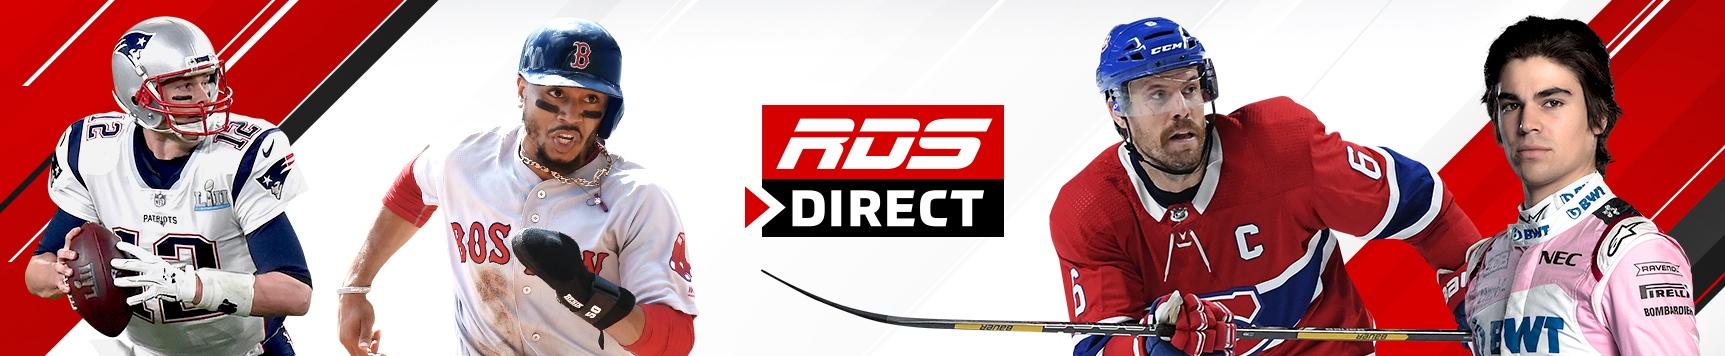 RDS Direct - Septembre